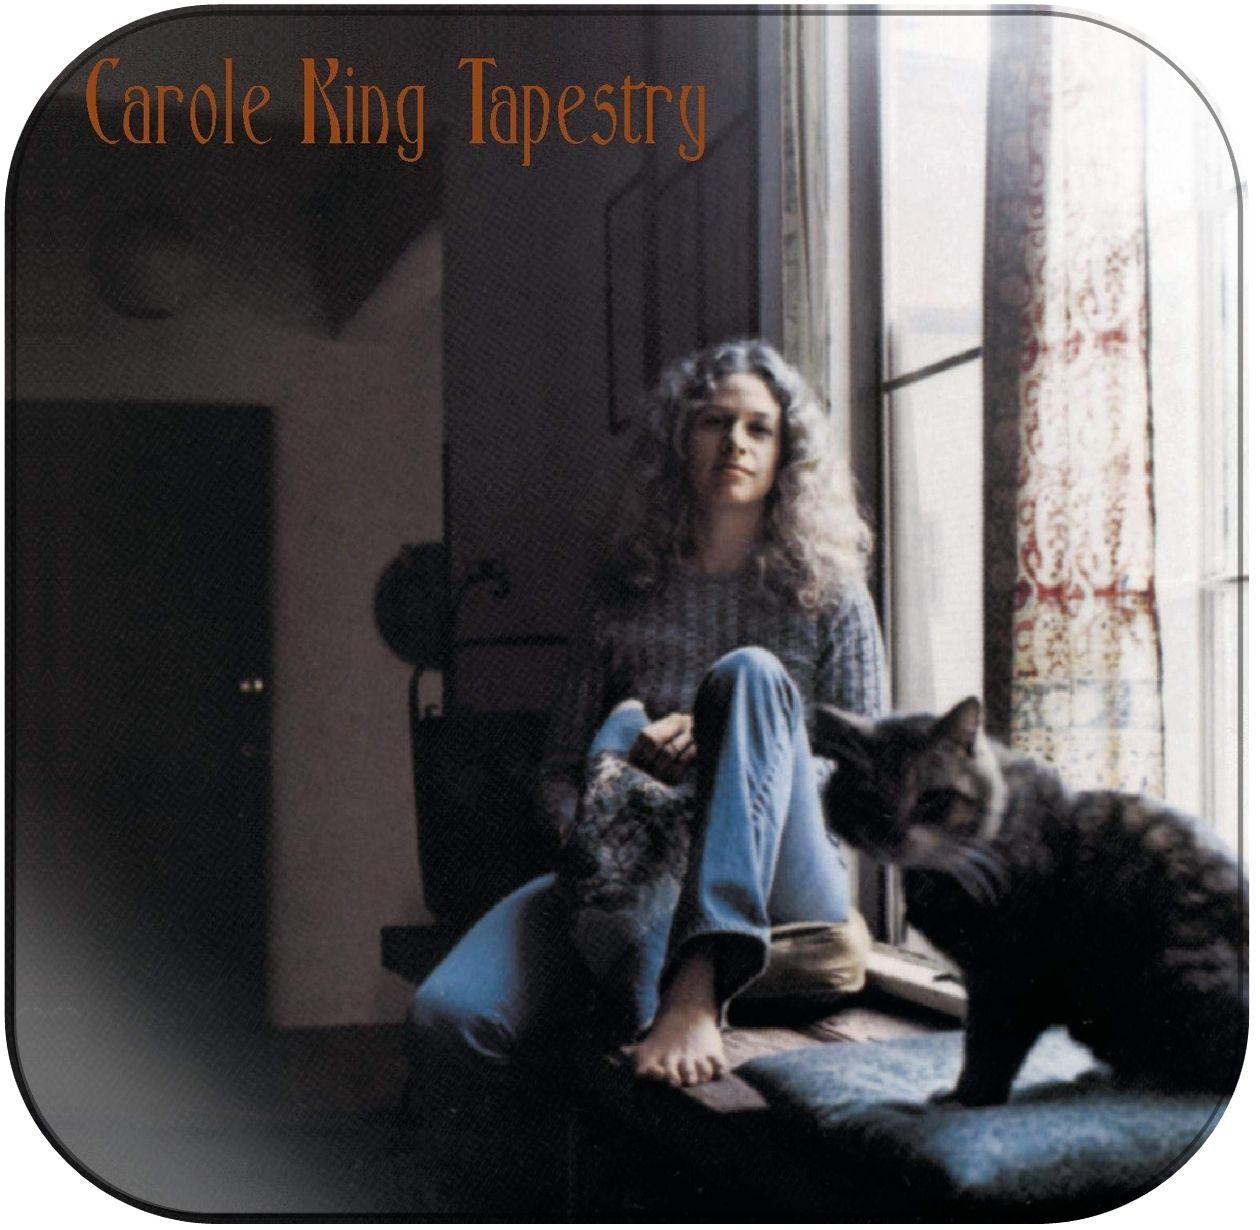 Carole King Tapestry Album Cover Sticker